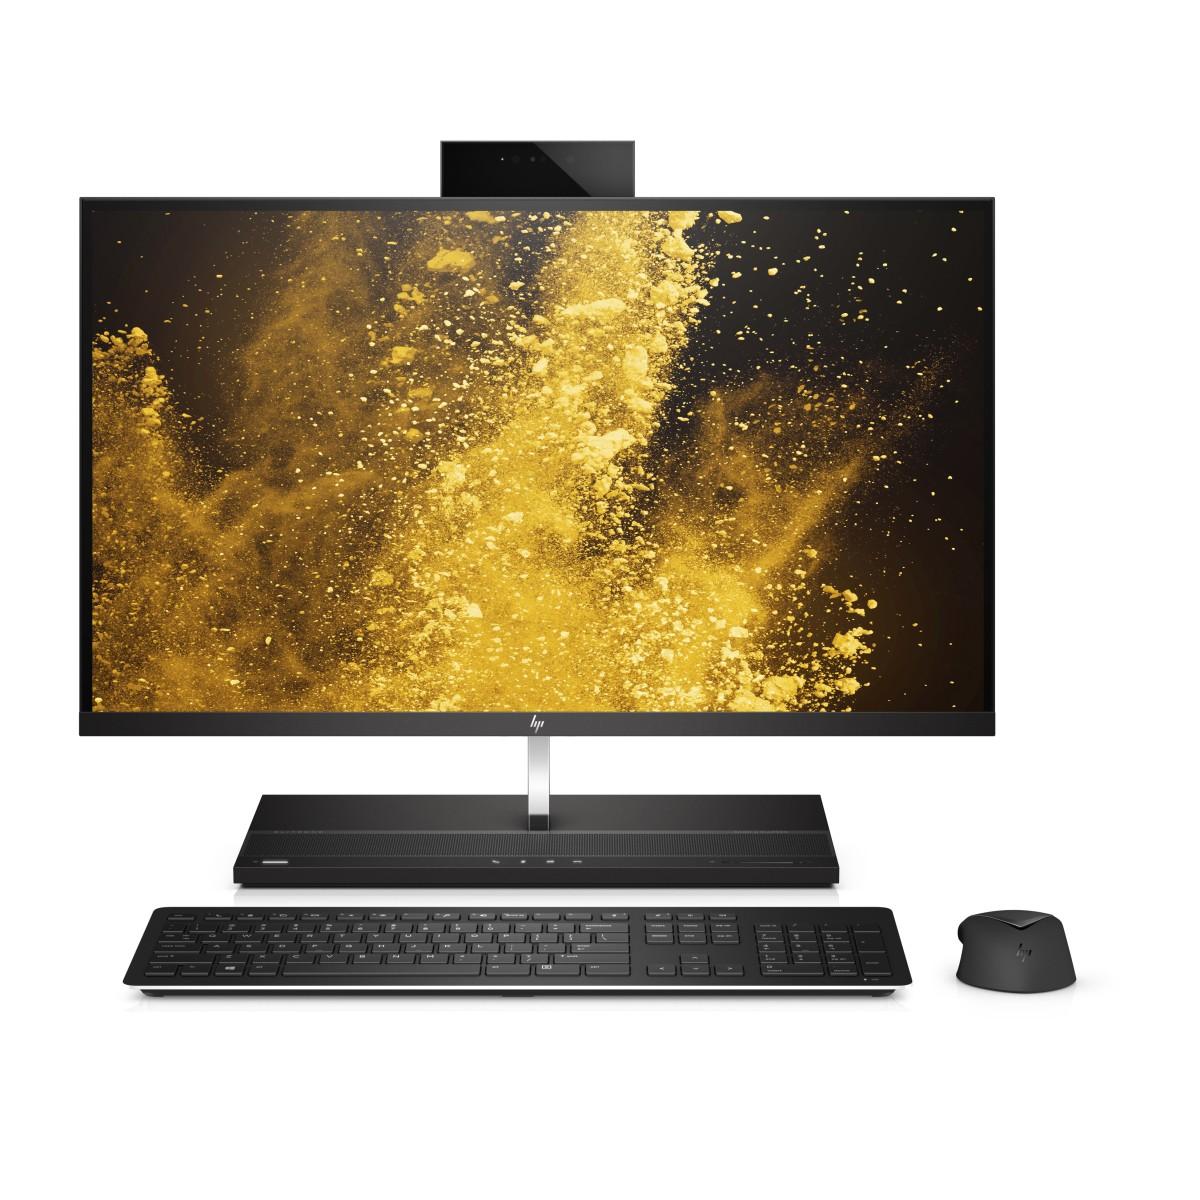 Obrázok produktu HP EliteOne 1000 G1 AiO 27 NT i5-7500/ 8GB/ 256SSD/ 3NBD/ 10P64